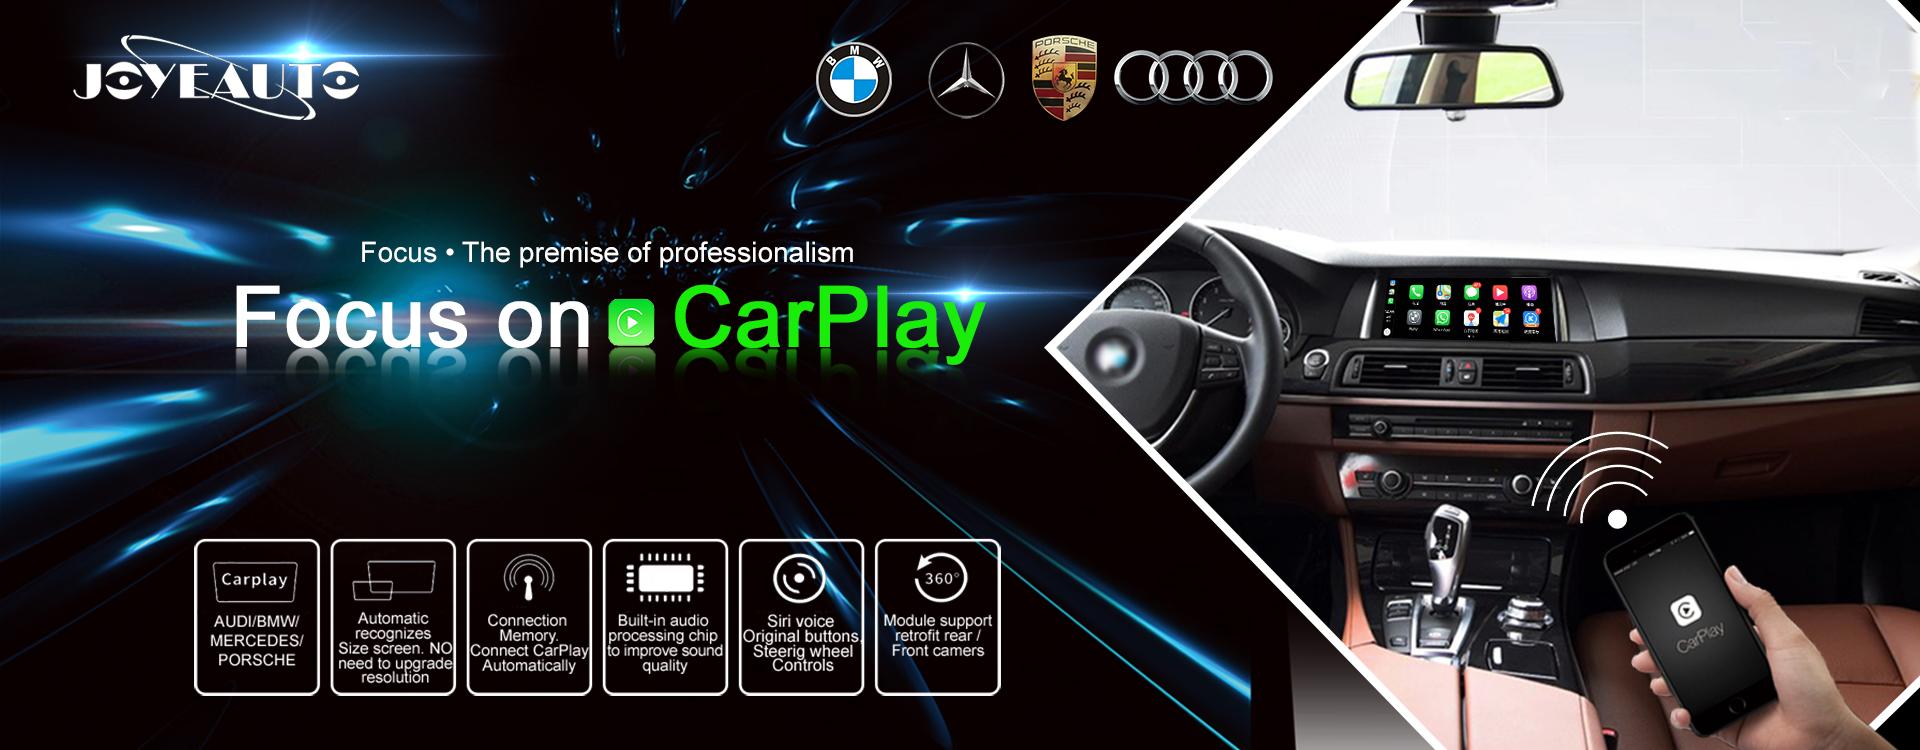 Joyeauto Technology – Aftermarket Automotive WiFi Wireless